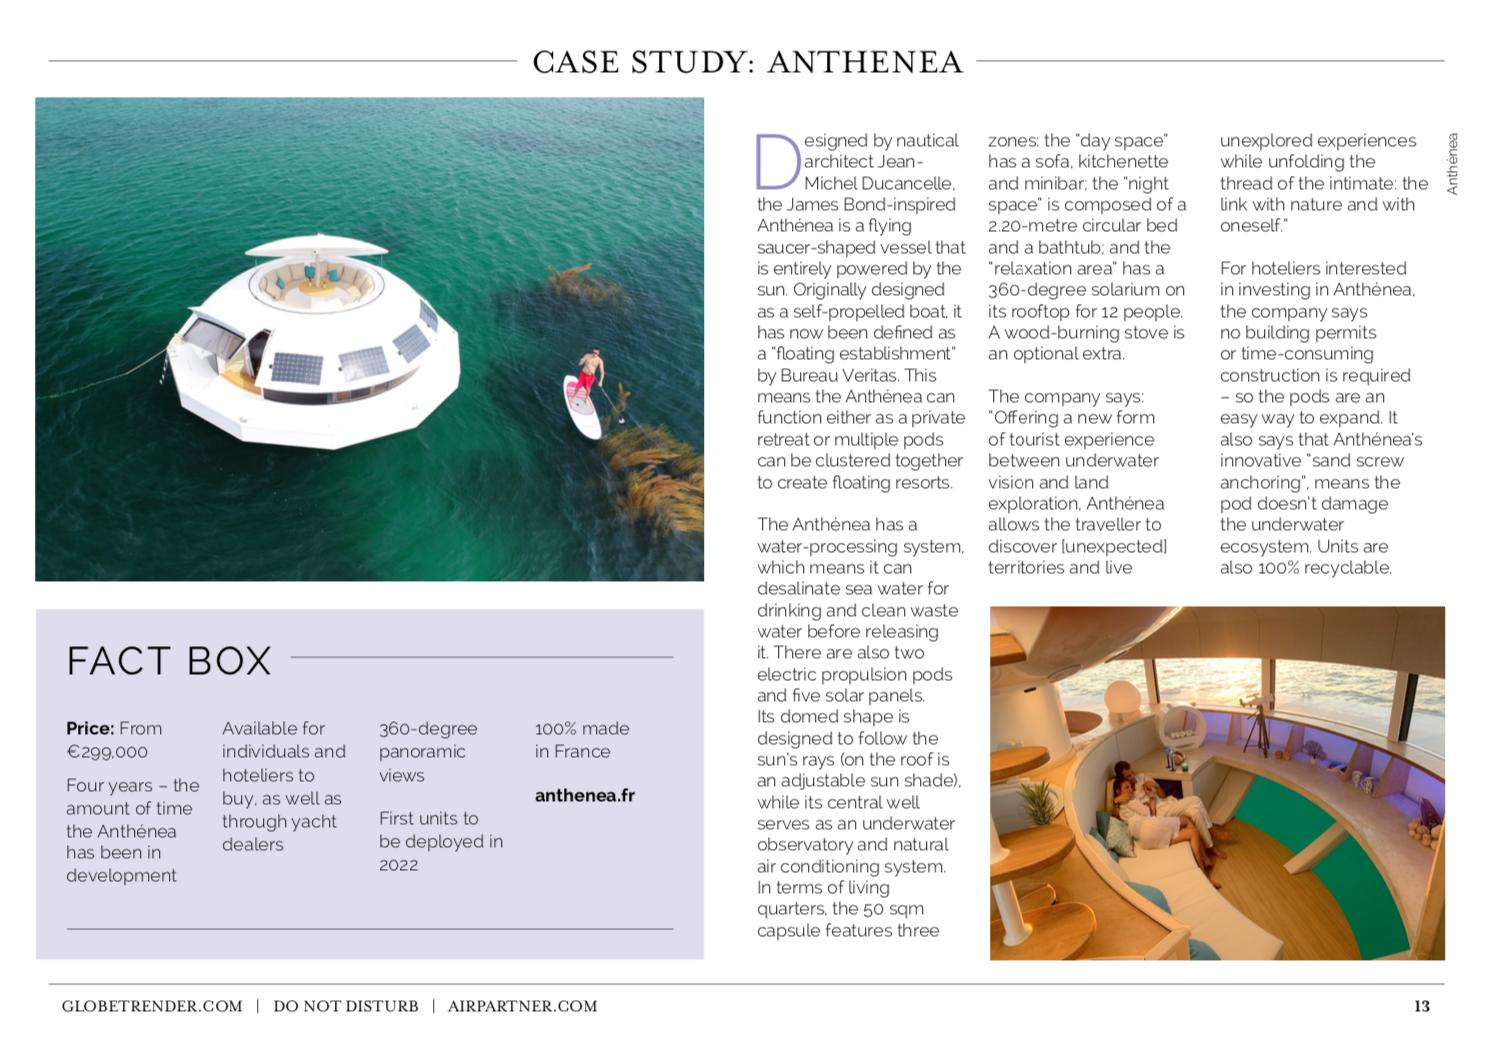 Anthenea case study